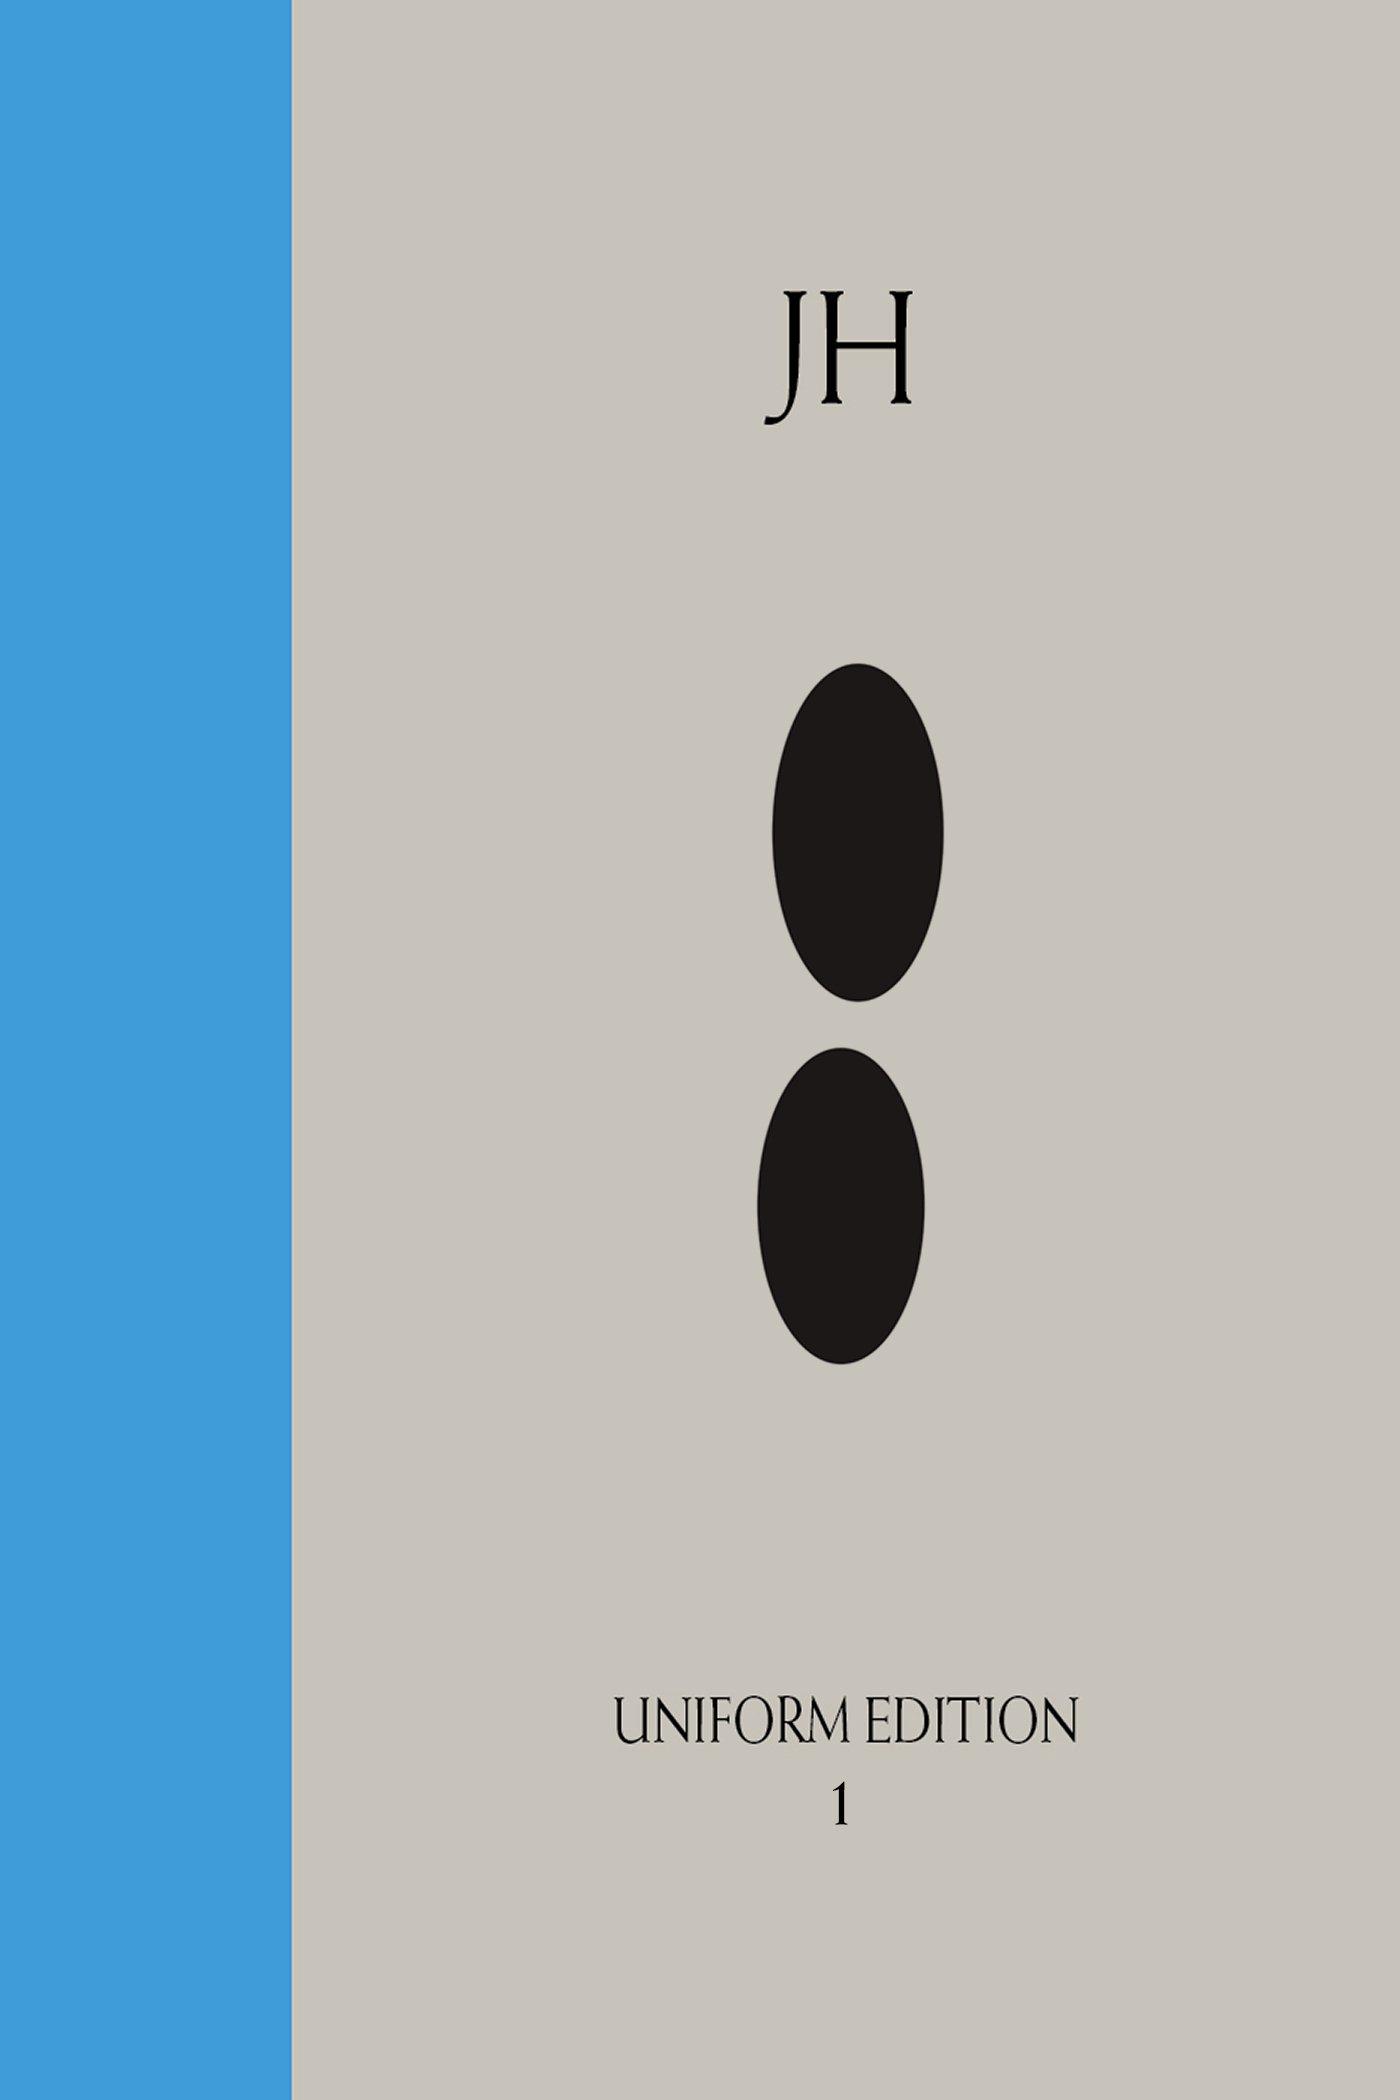 Archetypal Psychology: Uniform Edition of the Writings of James Hillman, Vol. 1 PDF